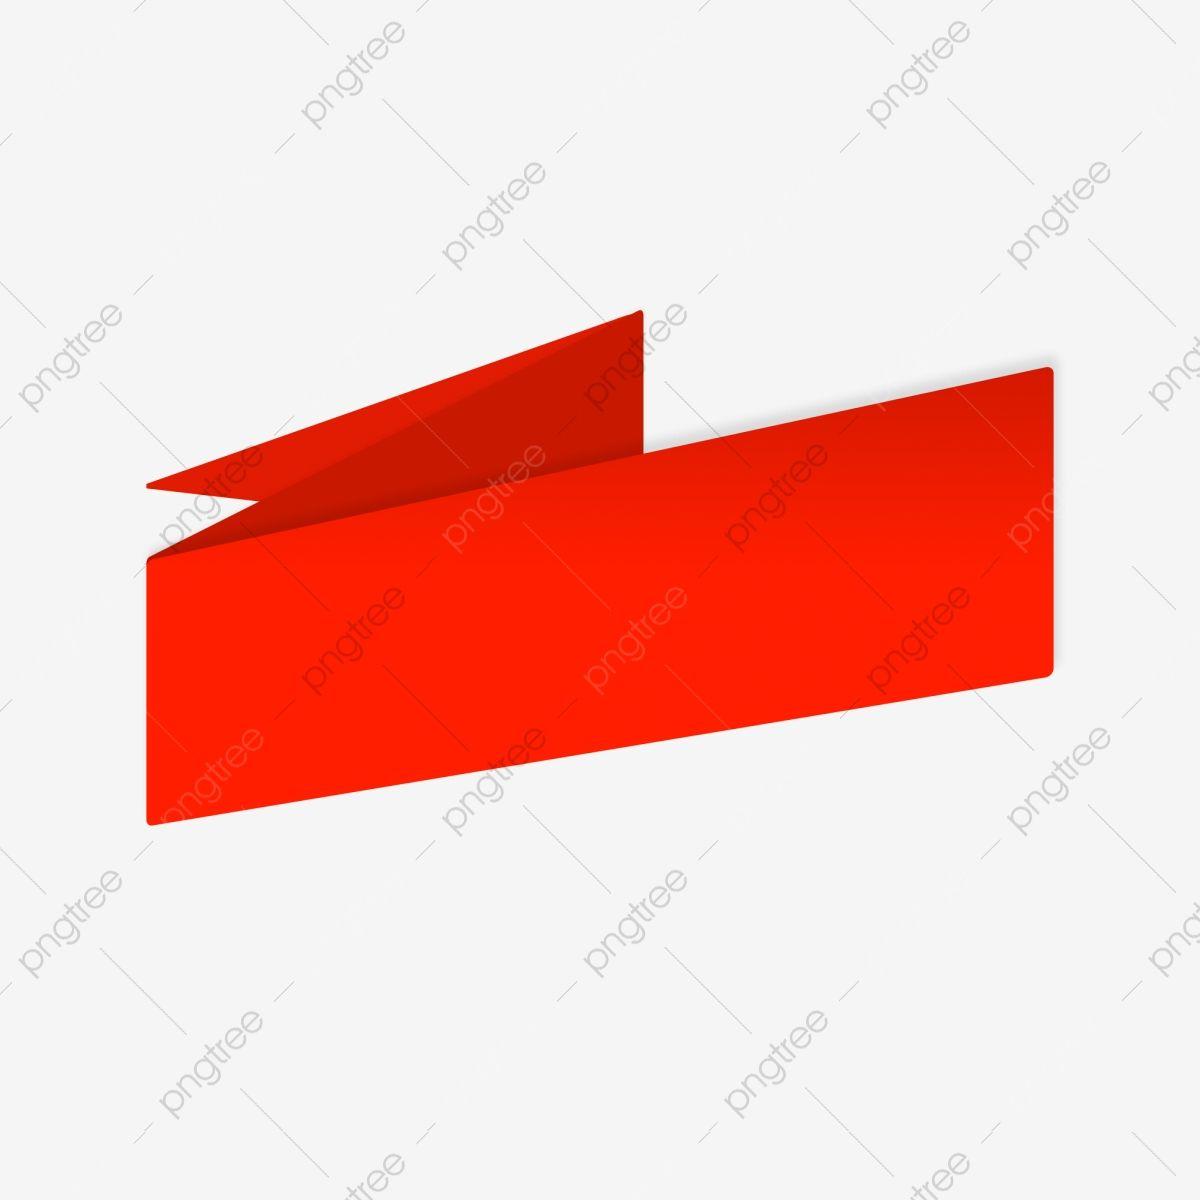 Gambar Label Harga Taobao Promosi Produk Baru Label Tanda Harga Tanda Promosi Png Dan Psd Untuk Muat Turun Percuma In 2021 Geometric Background Graphic Resources Labels